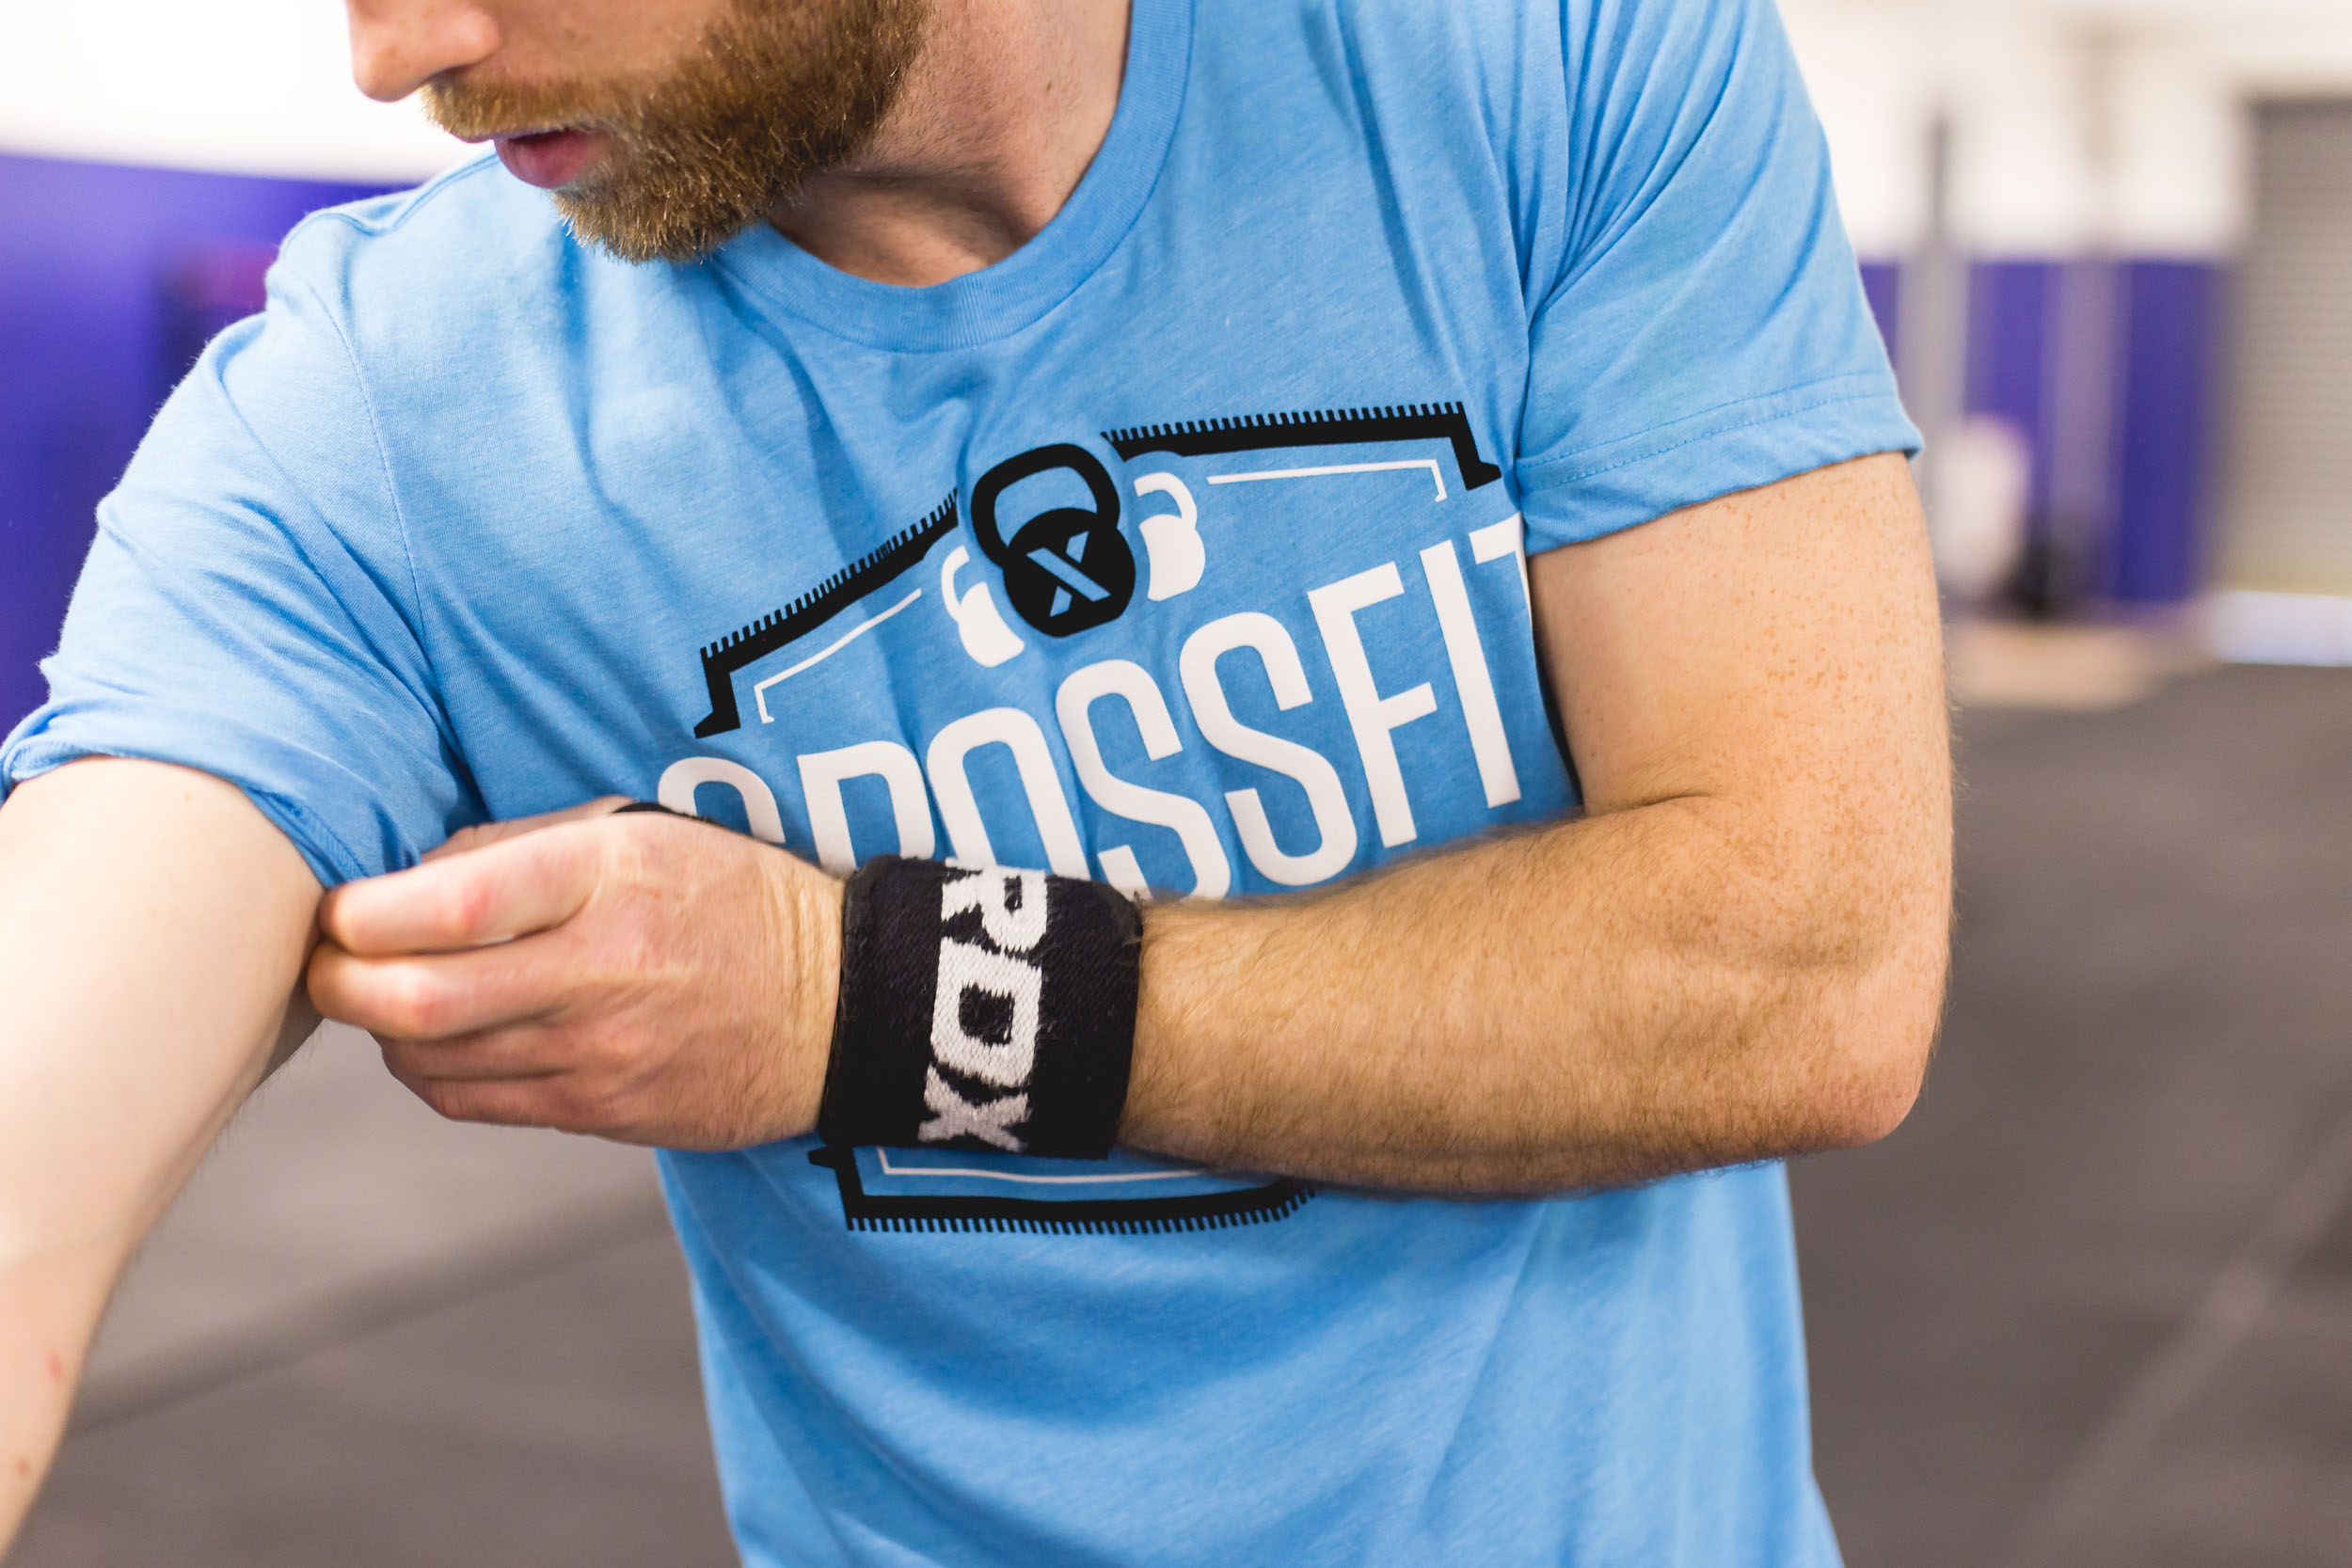 Crossfit UK printed clothing t-shirts-9170.jpg